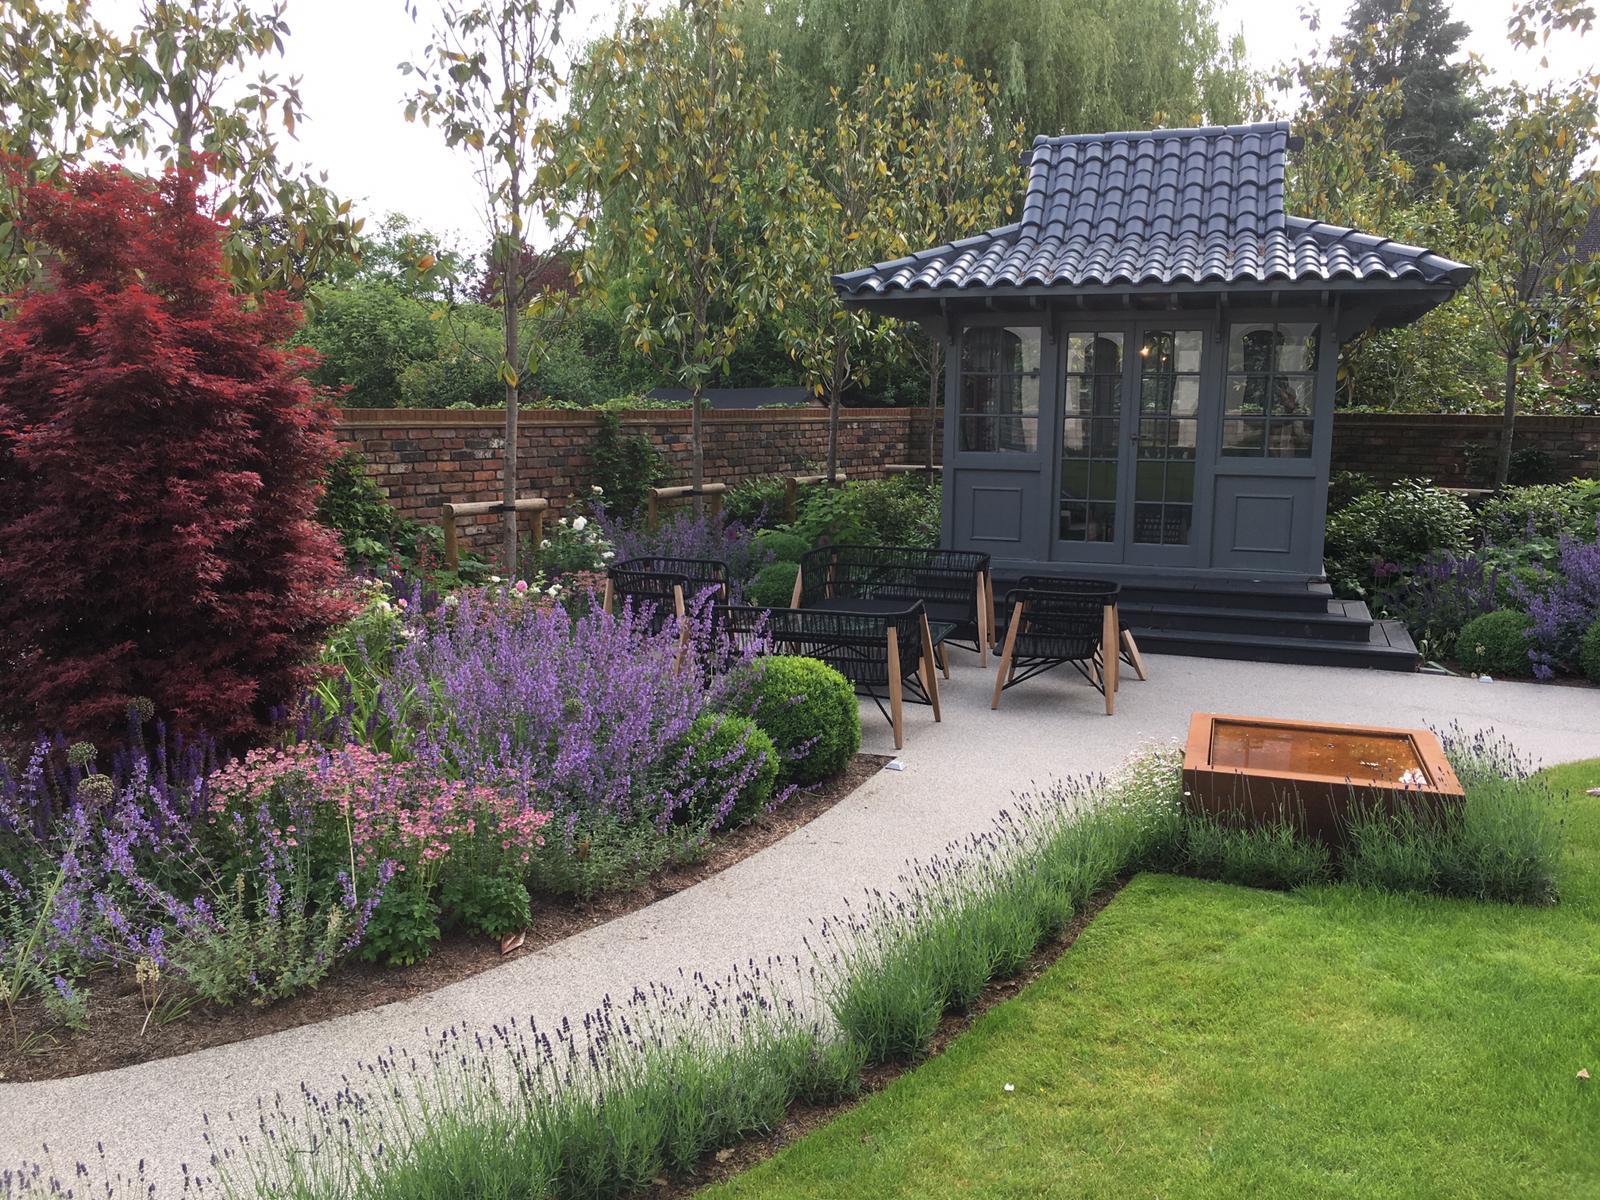 Bushy Business - Surrey Planting Project; Esher, Surrey